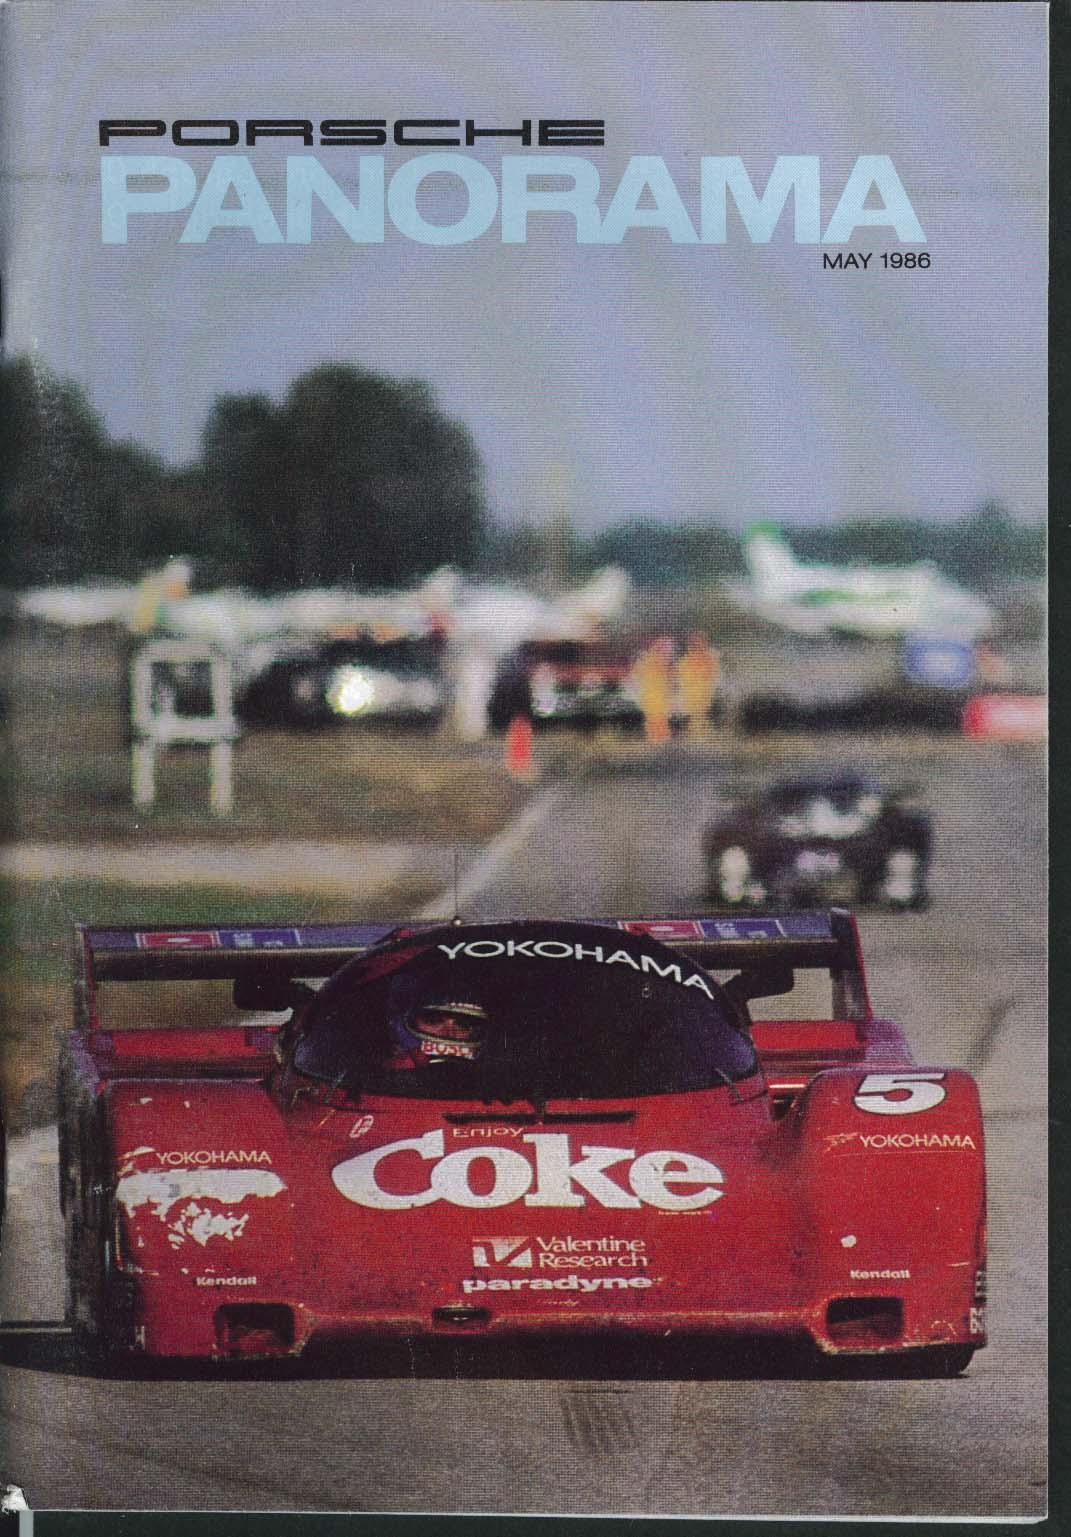 PORSCHE PANORAMA Tony Lapine David Colman PGA Sheraton 959 928 Tech 5 1986